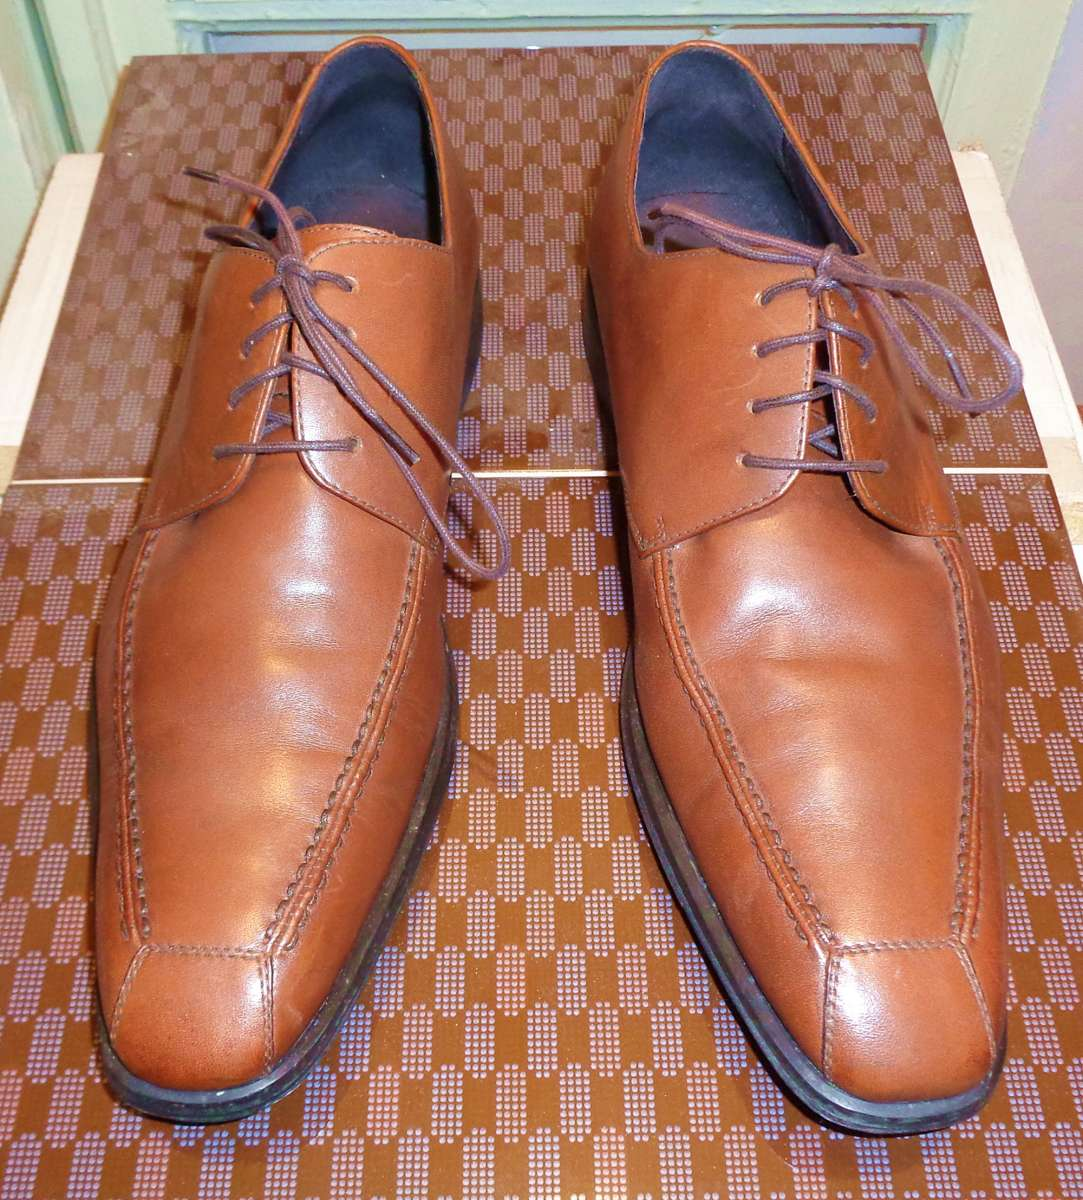 44 размер Туфли коричневые Blue Street Германия ботинки